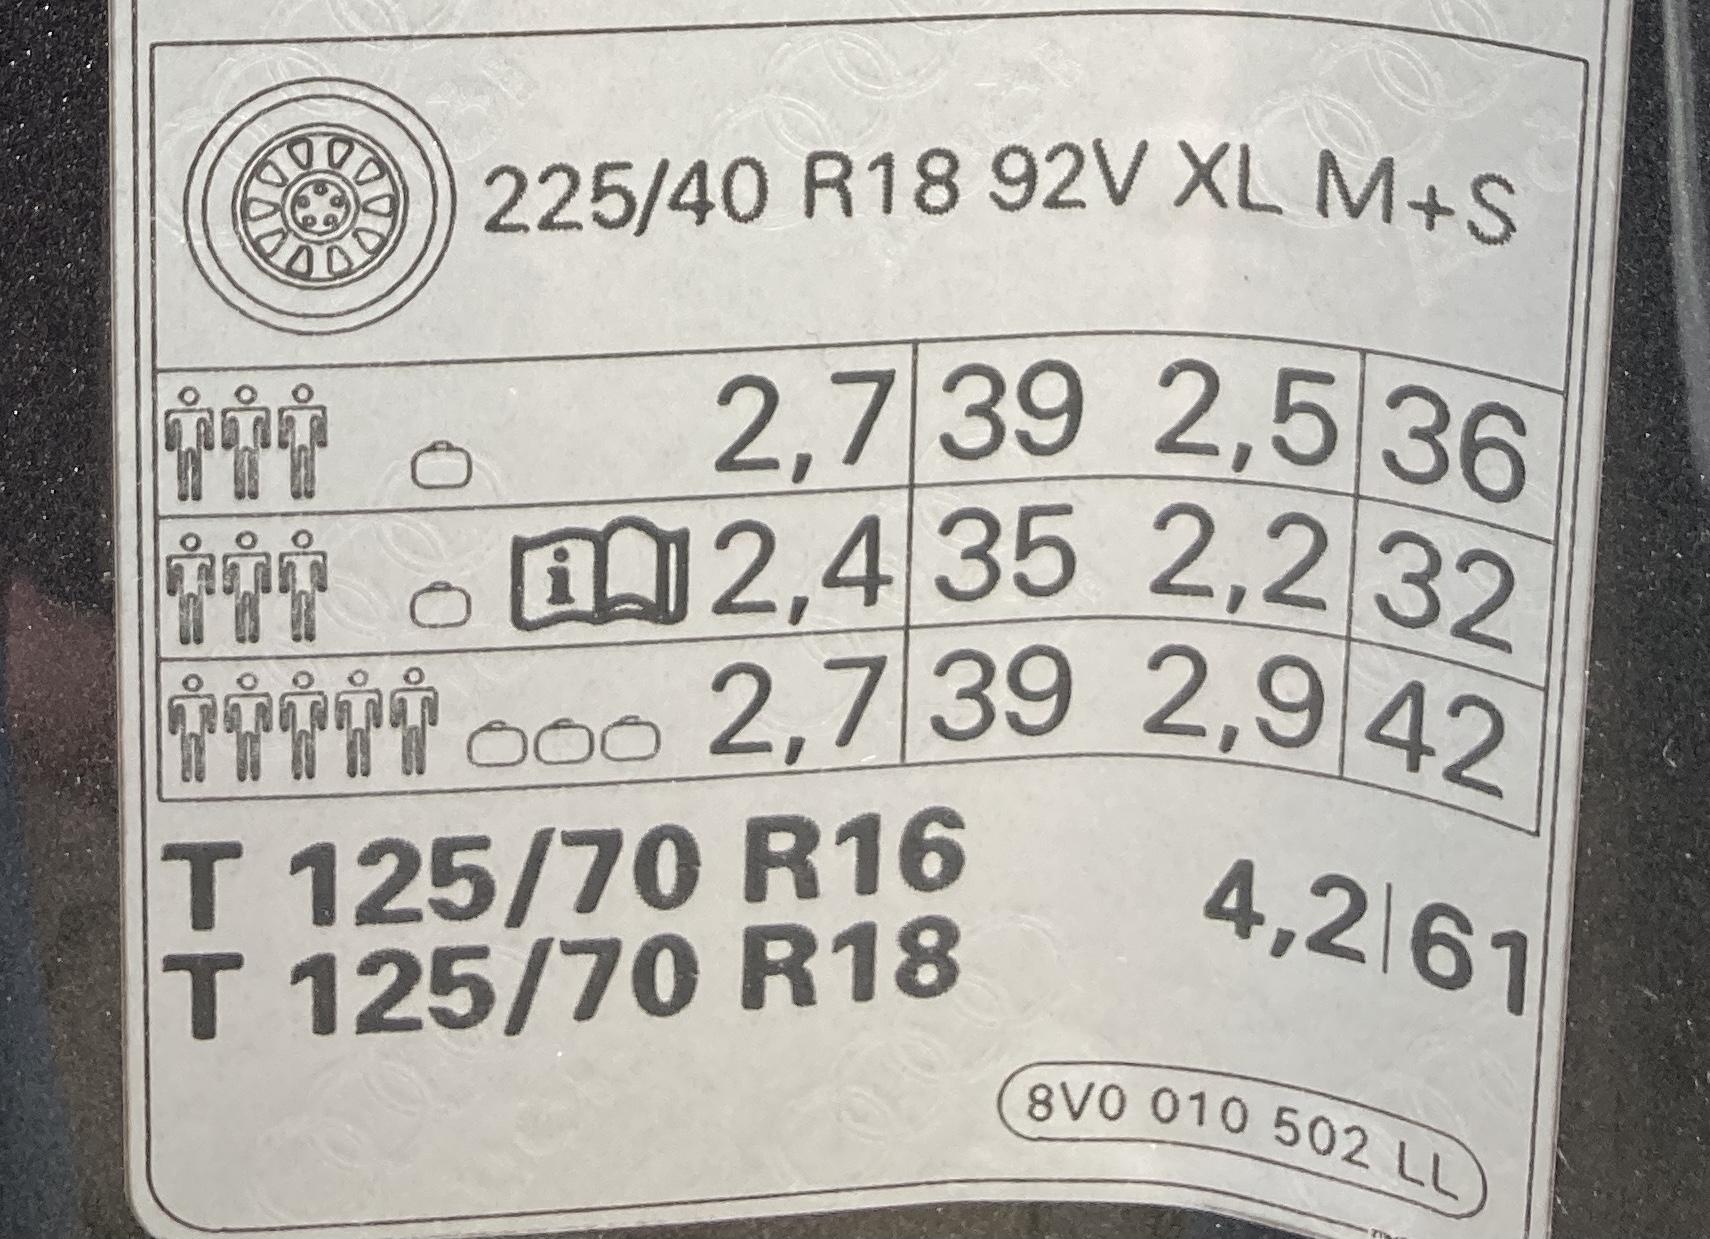 591B4F7D-30BC-4653-8D90-2511E030CA0A.jpeg